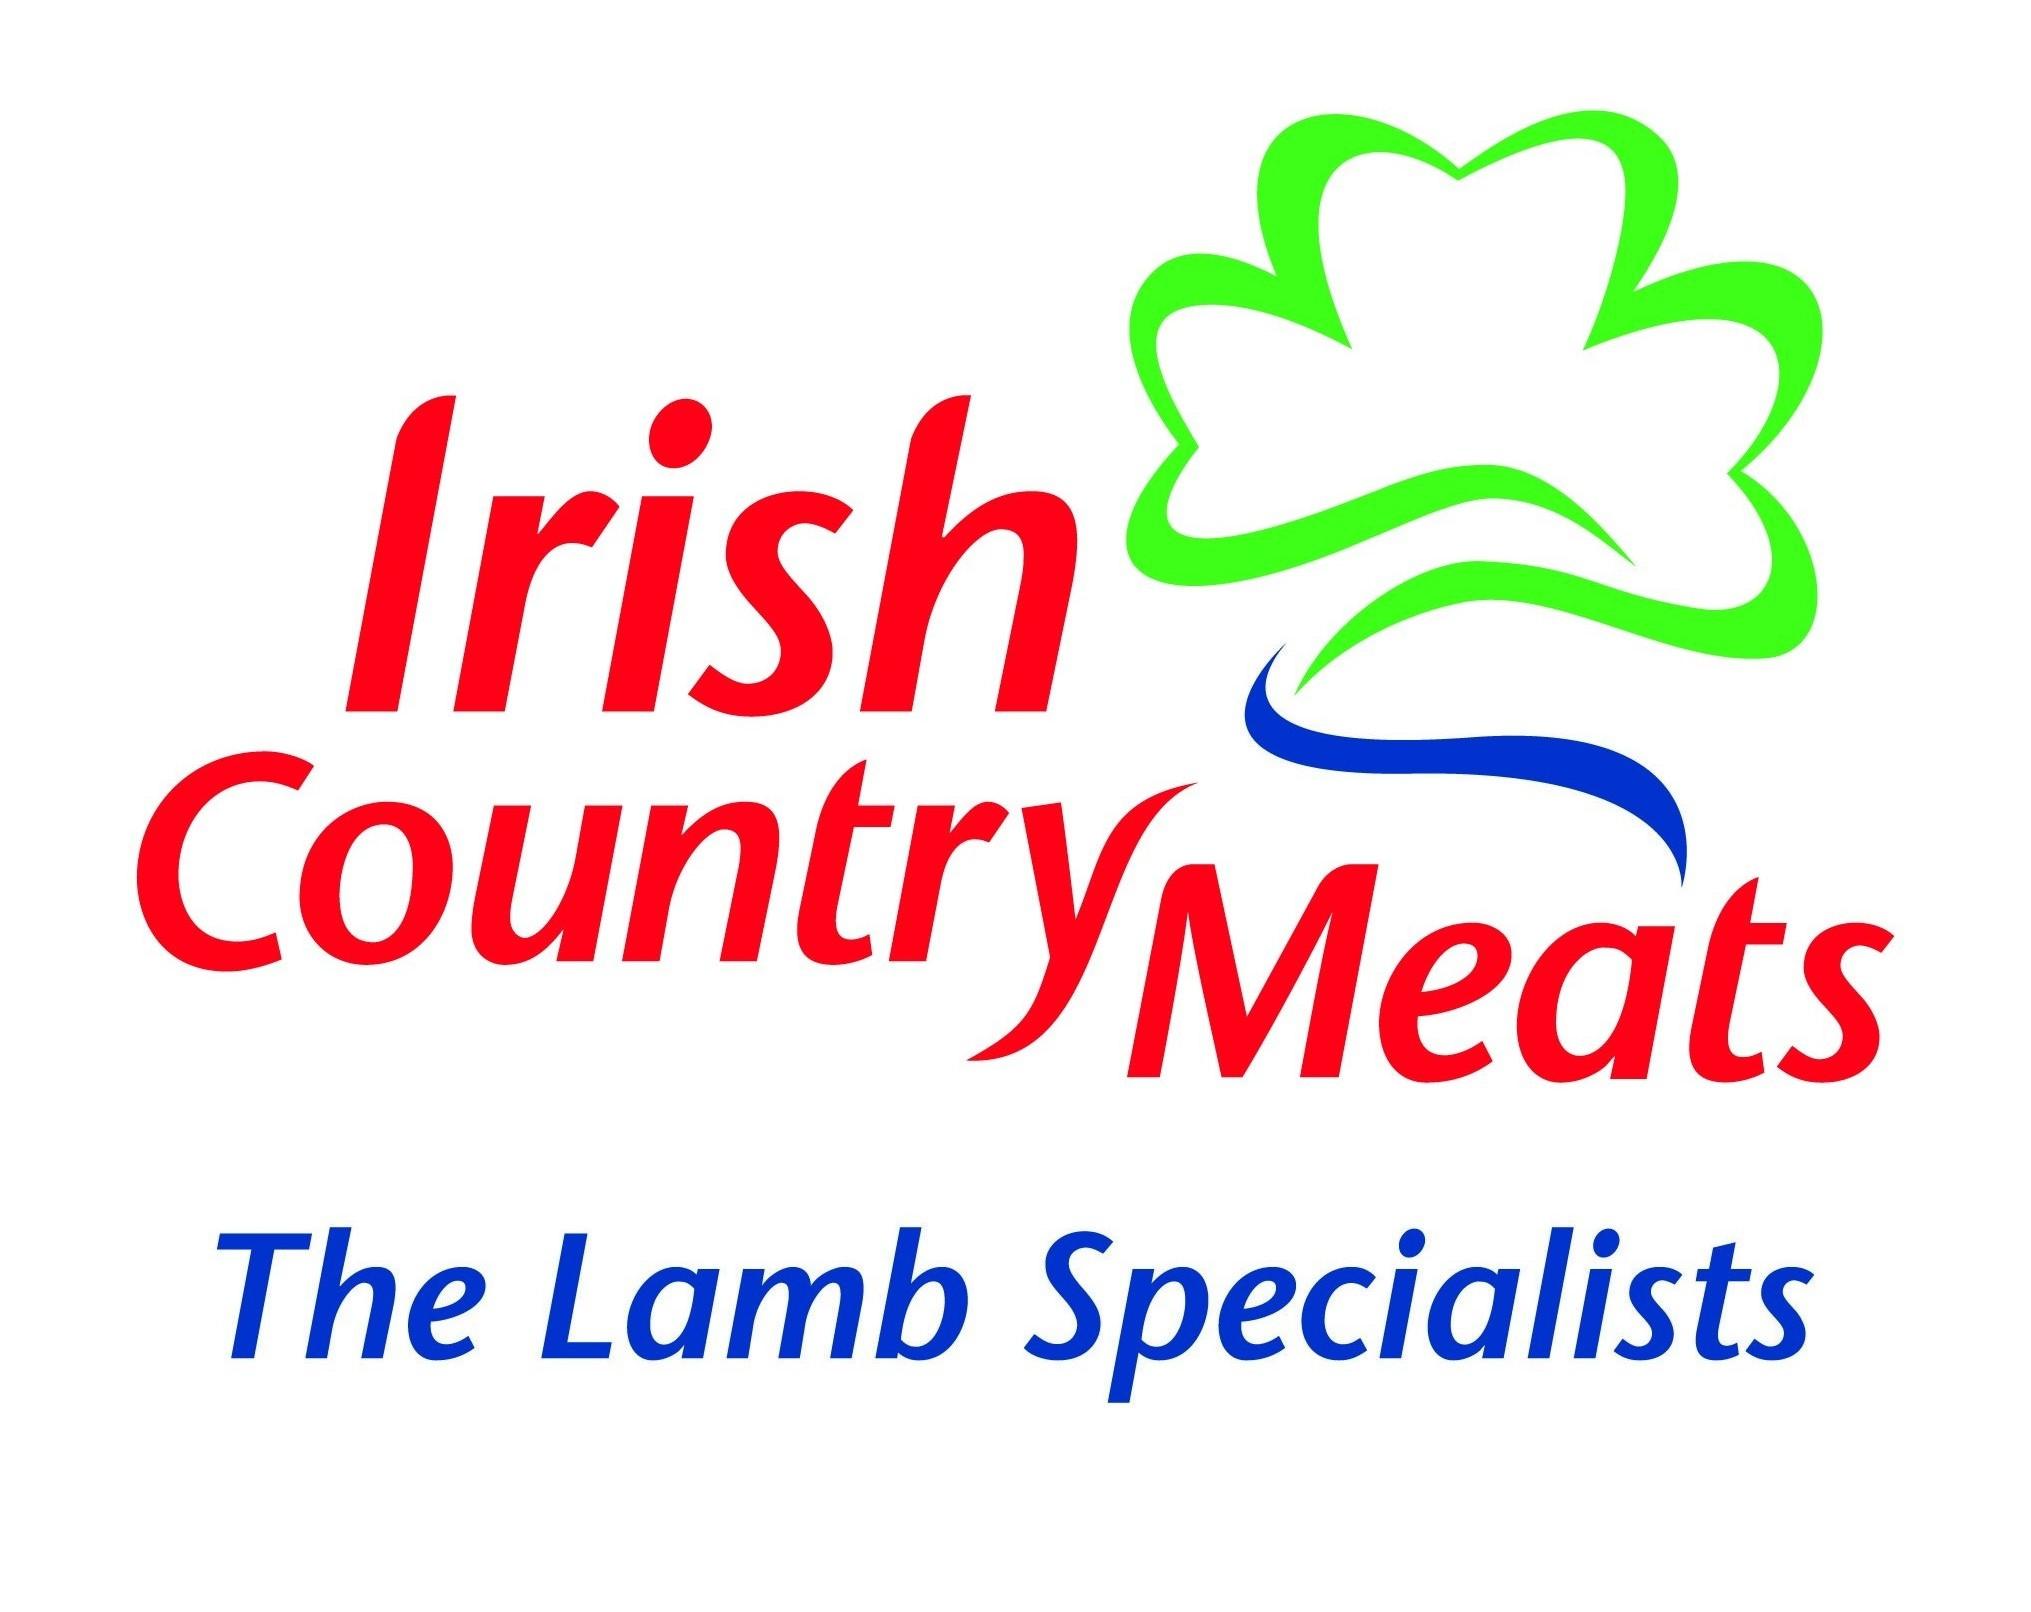 Irish Country Meats